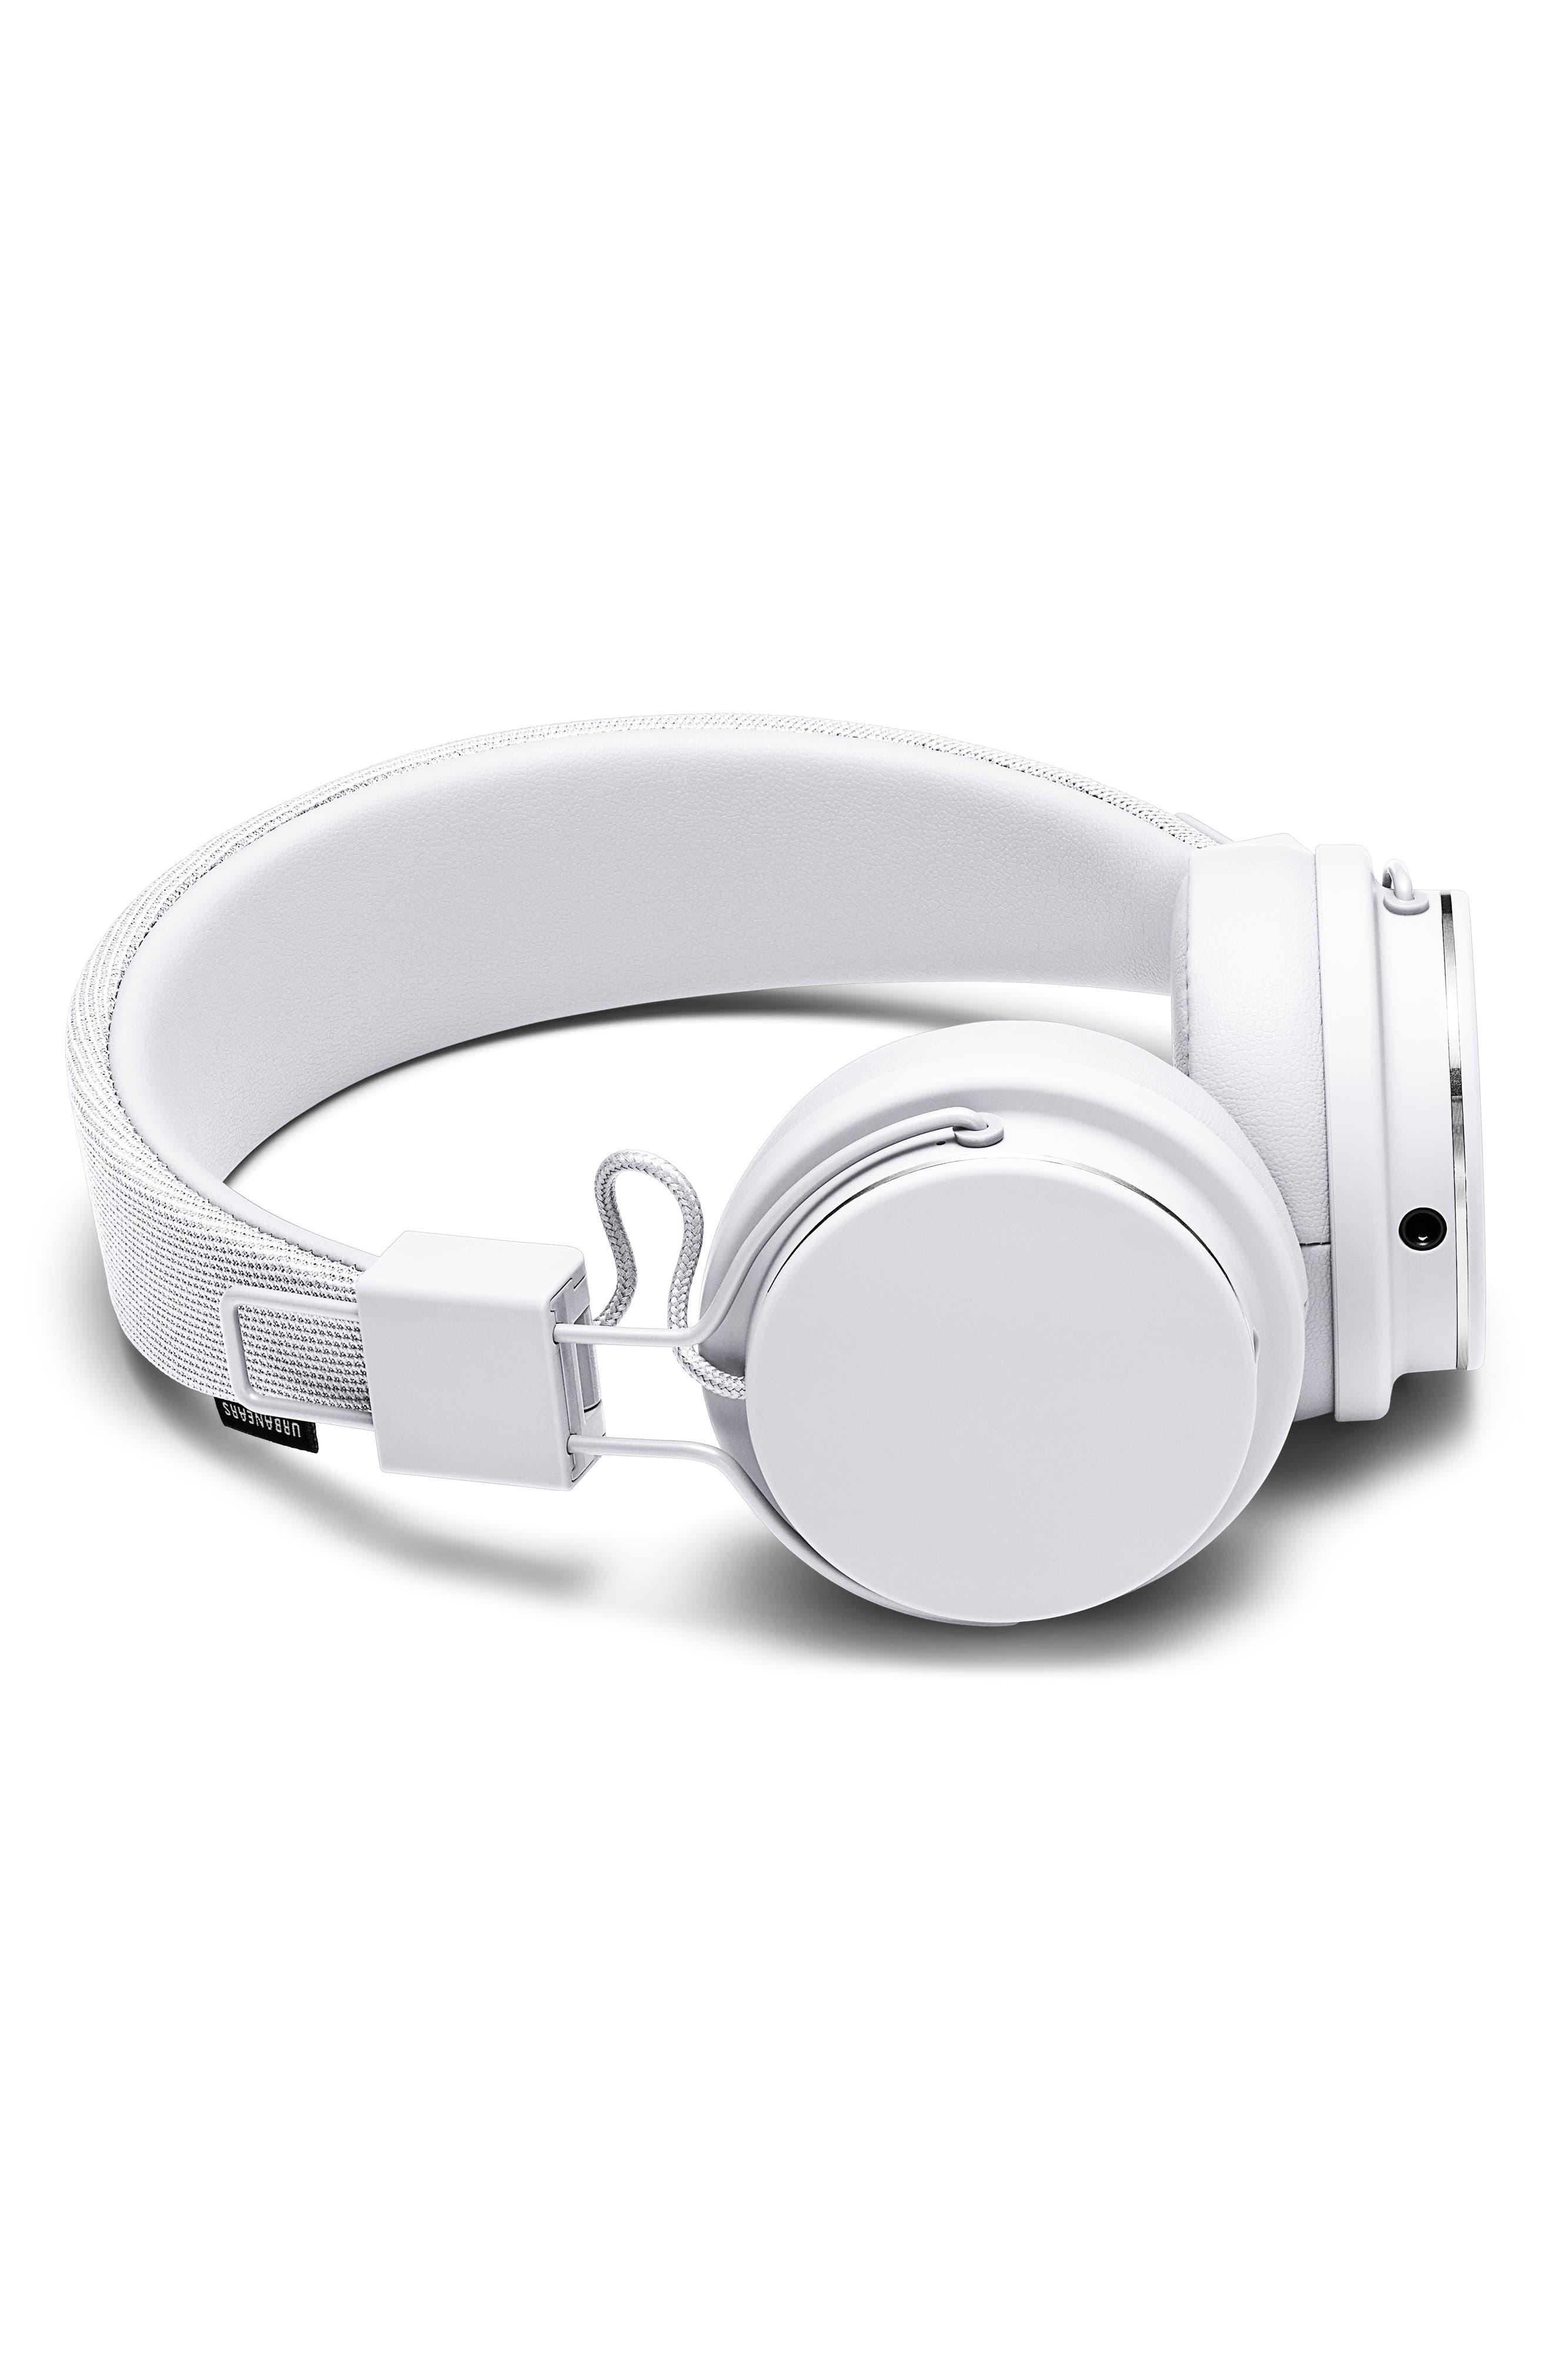 Plattan II On-Ear Headphones,                             Alternate thumbnail 2, color,                             TRUE WHITE